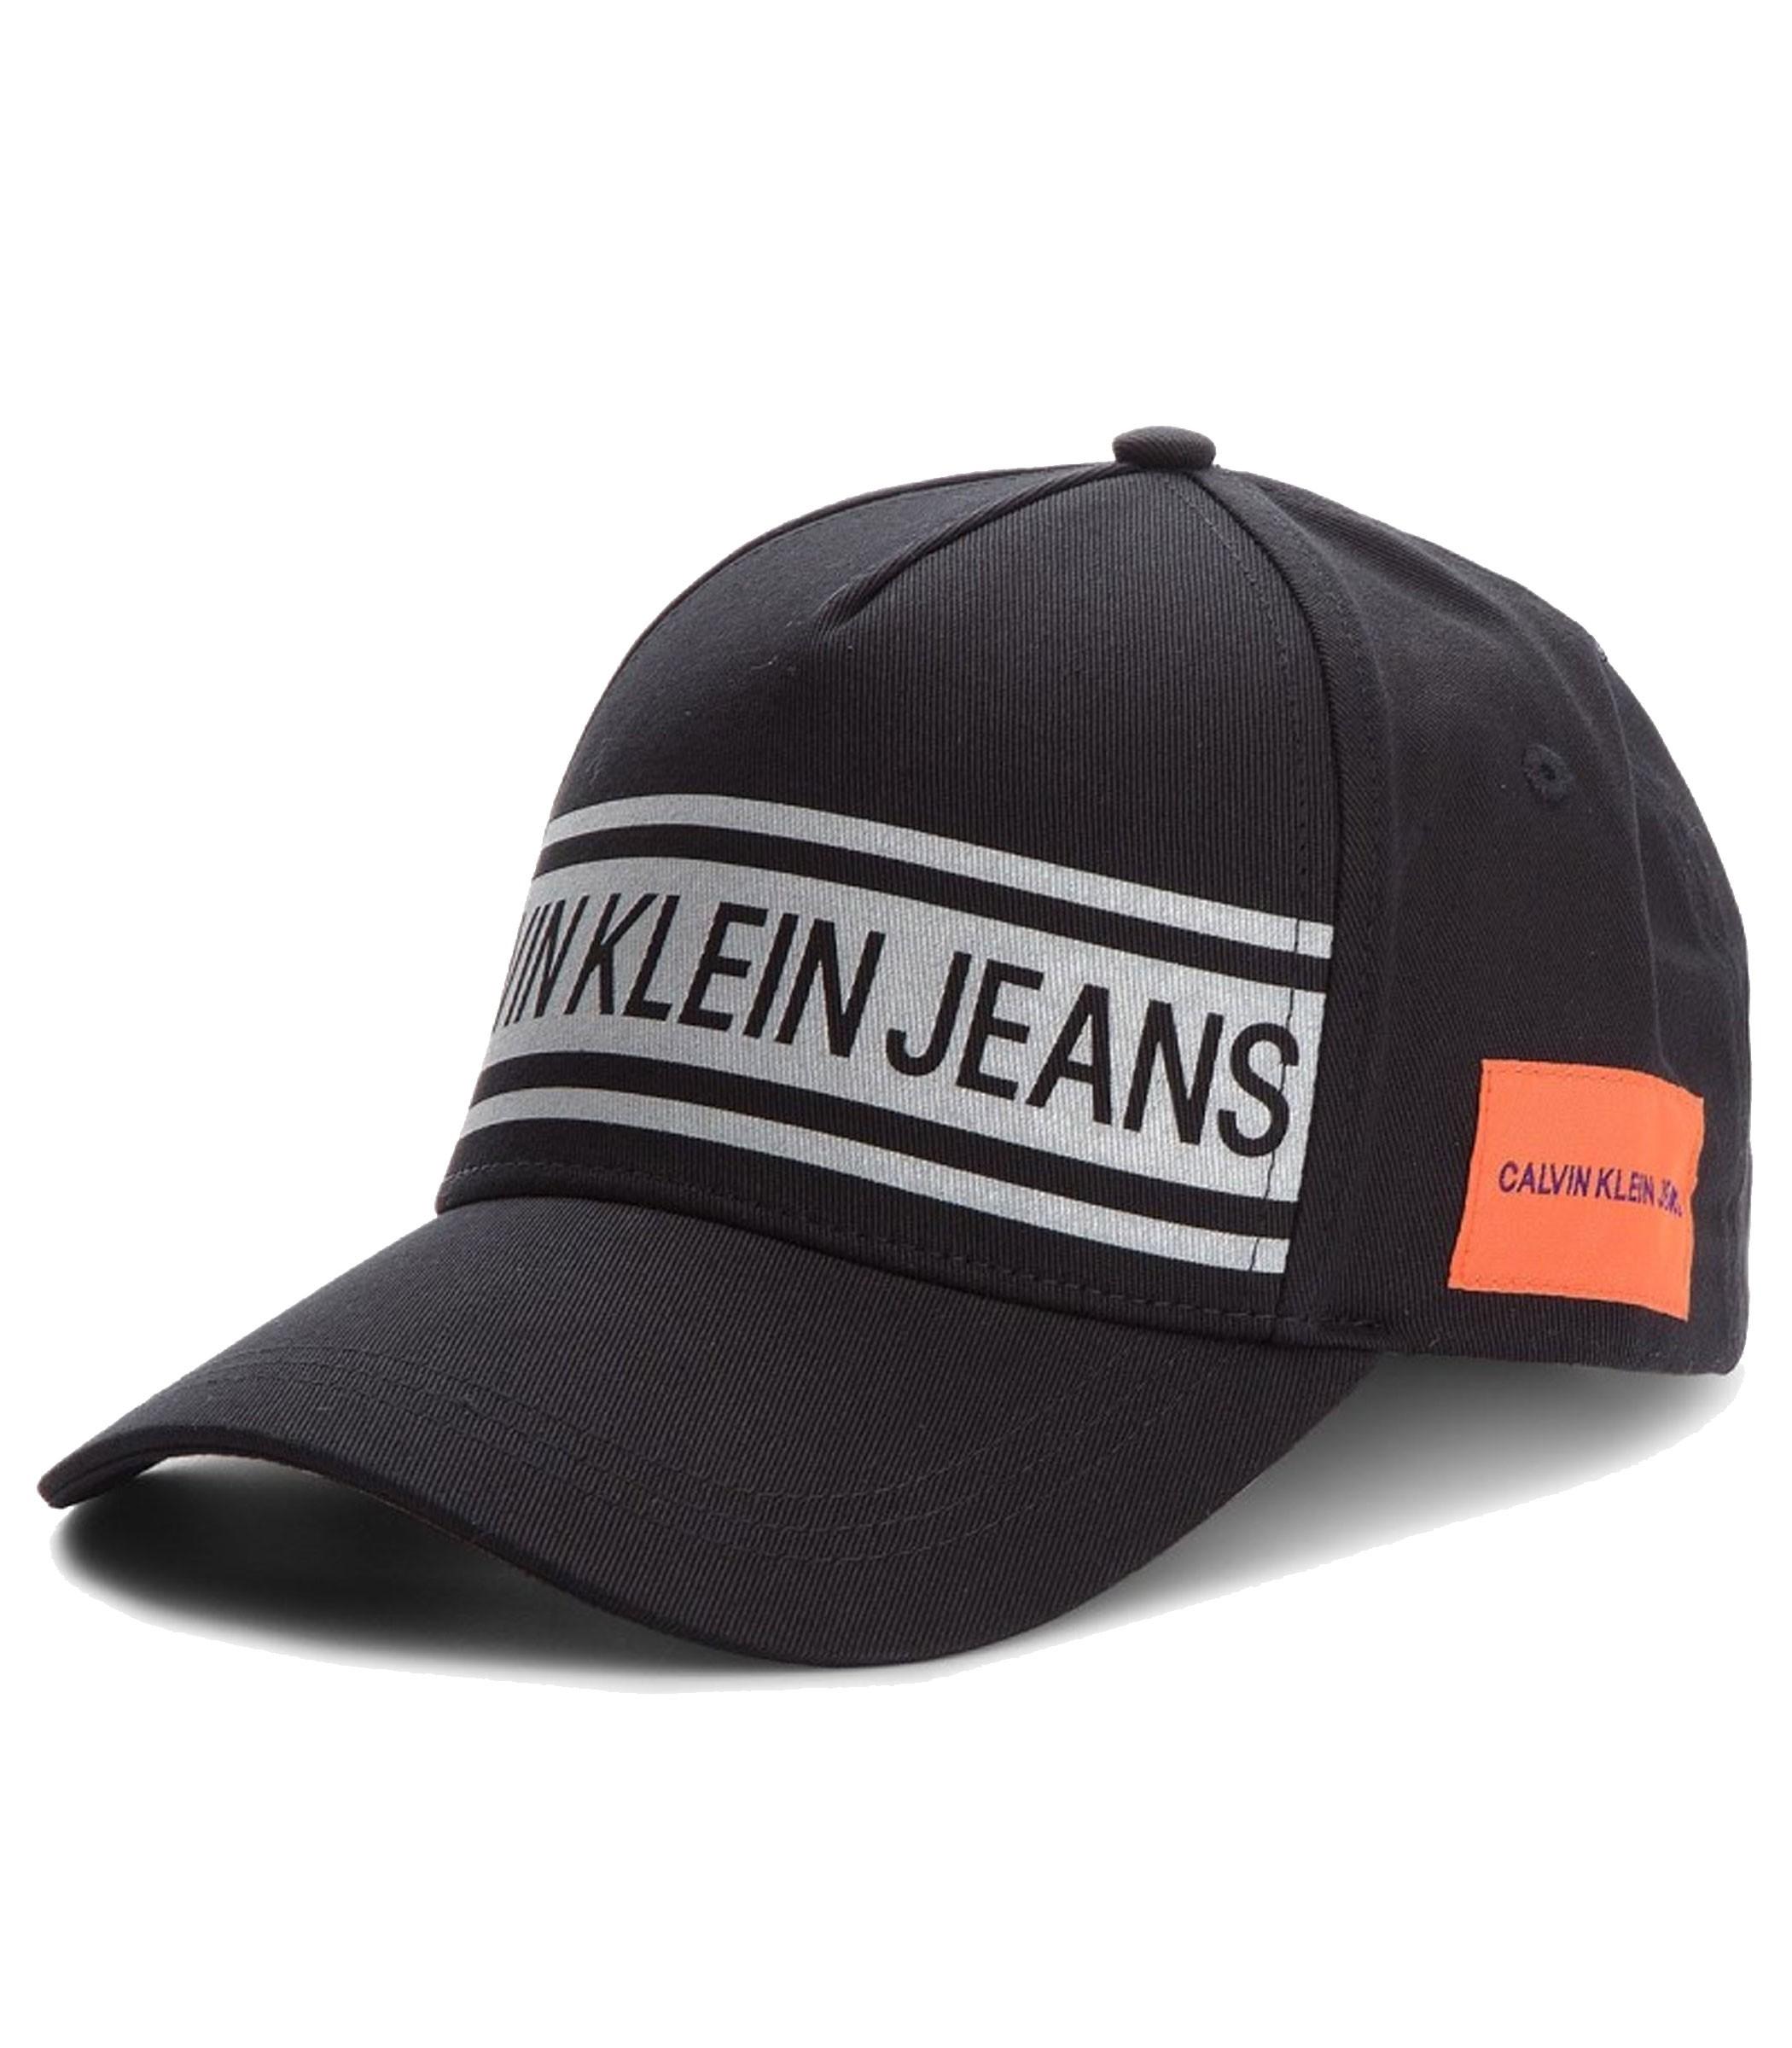 Cappello con visiera CALVIN KLEIN JEANS rif. K40K400767 ac6257d3d32b